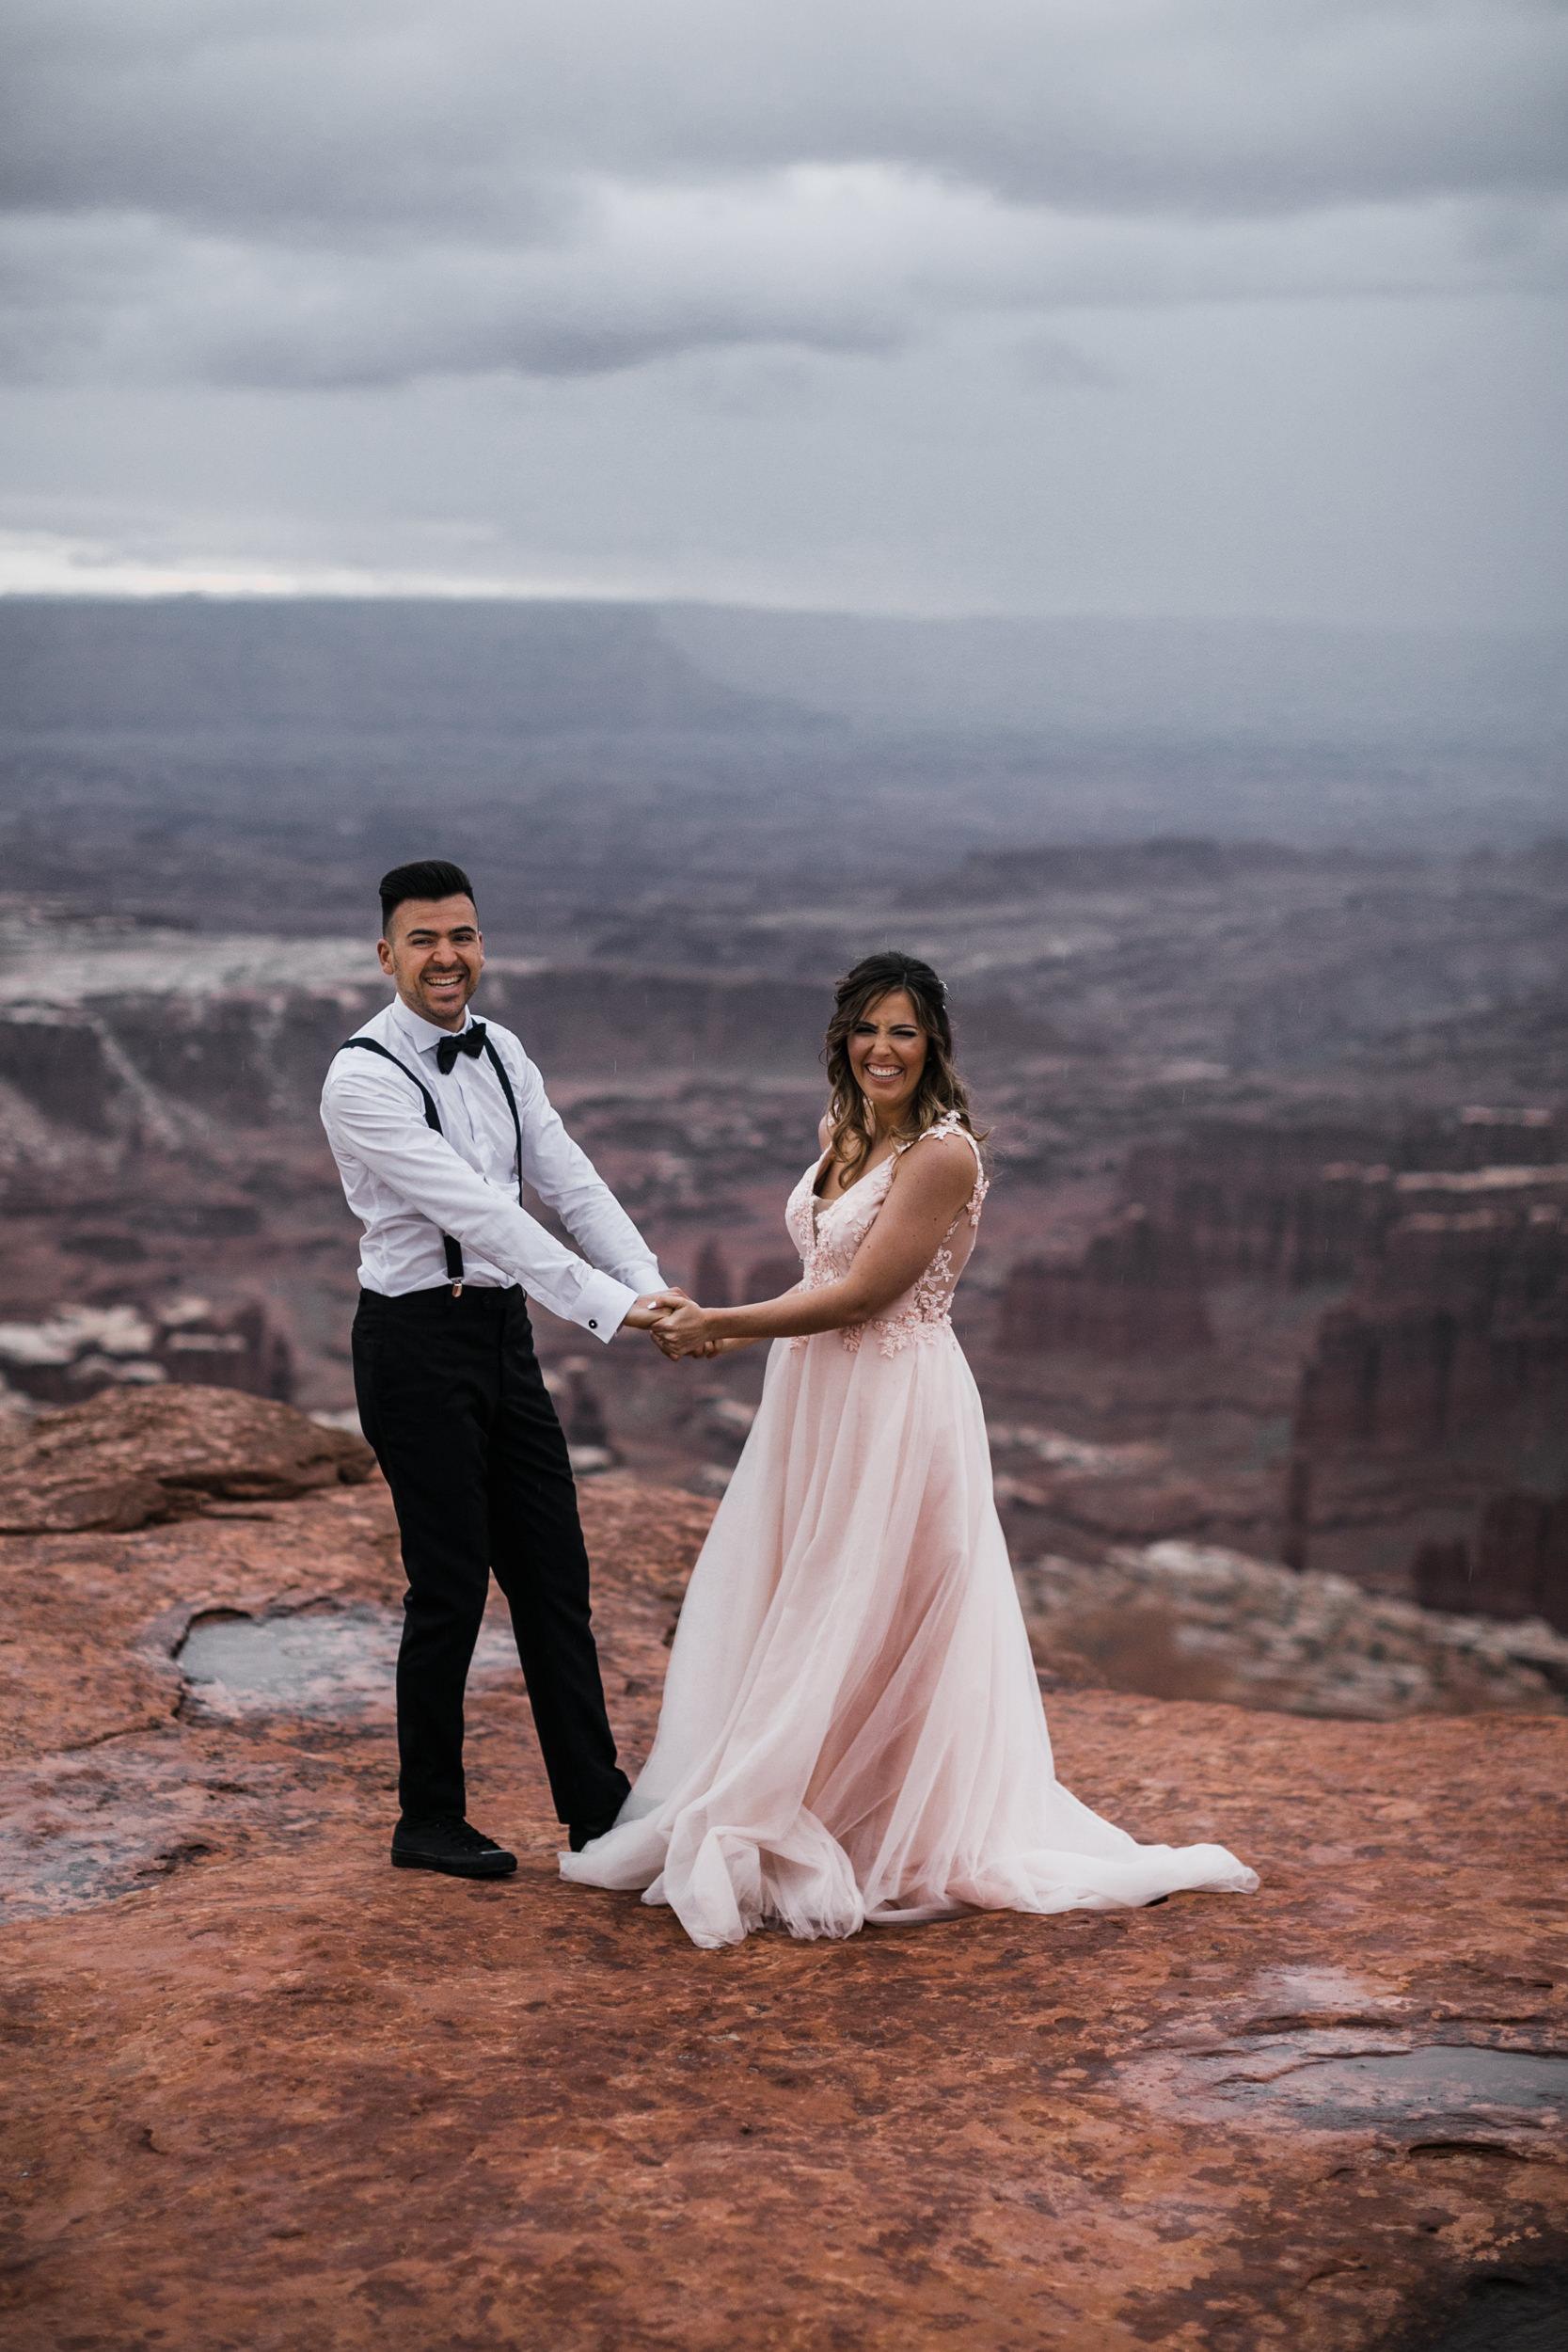 Hearnes-Elopement-Photography-Canyonlands-National-Park-Moab-Wedding-31.jpg